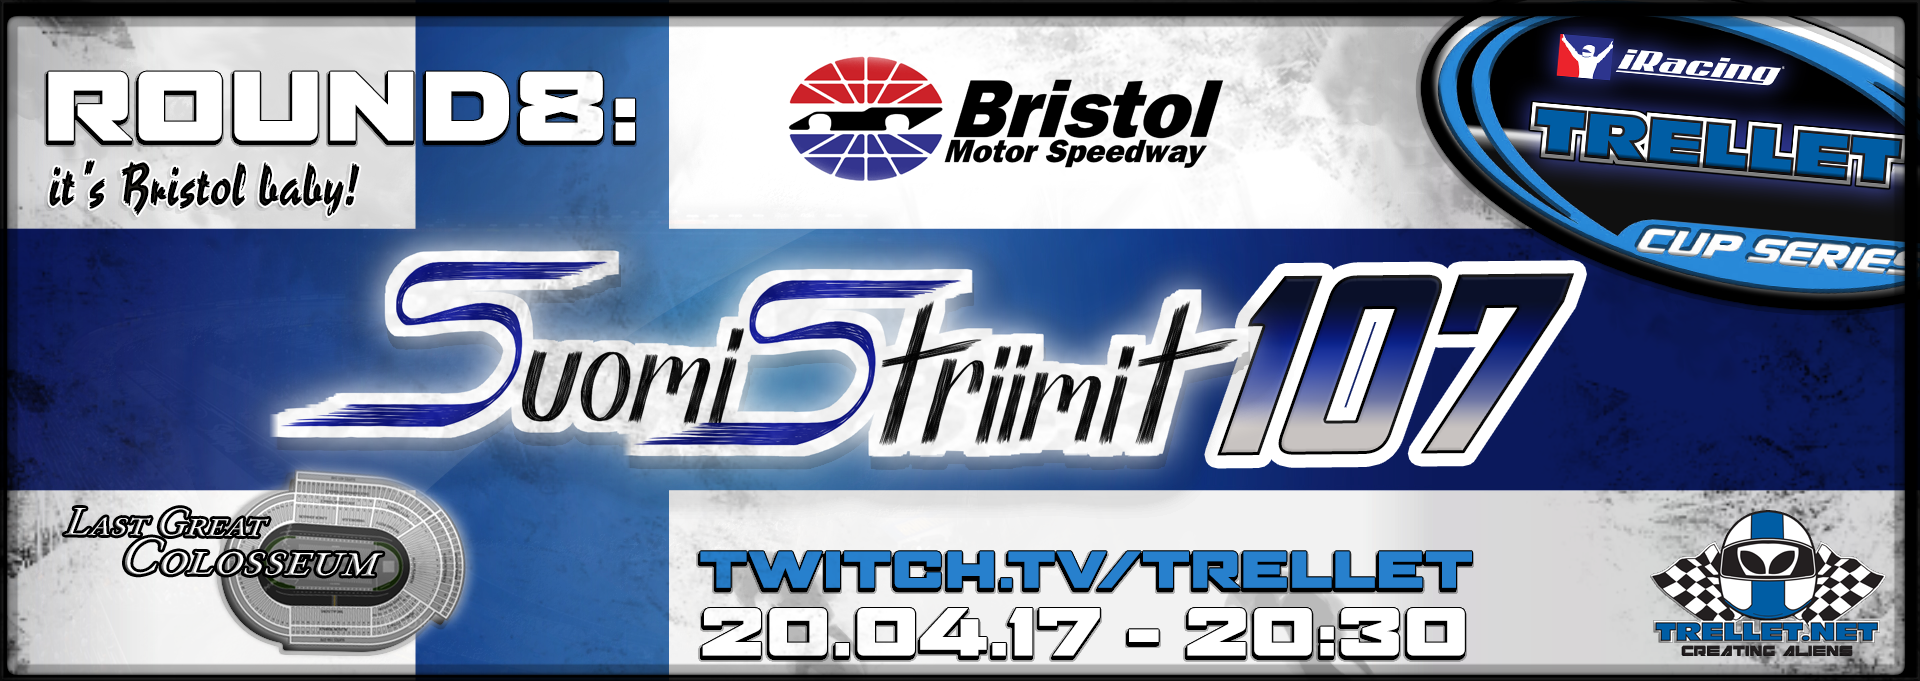 Suomistriimit 107 Bristol Motor Speedway Suora L Hetys